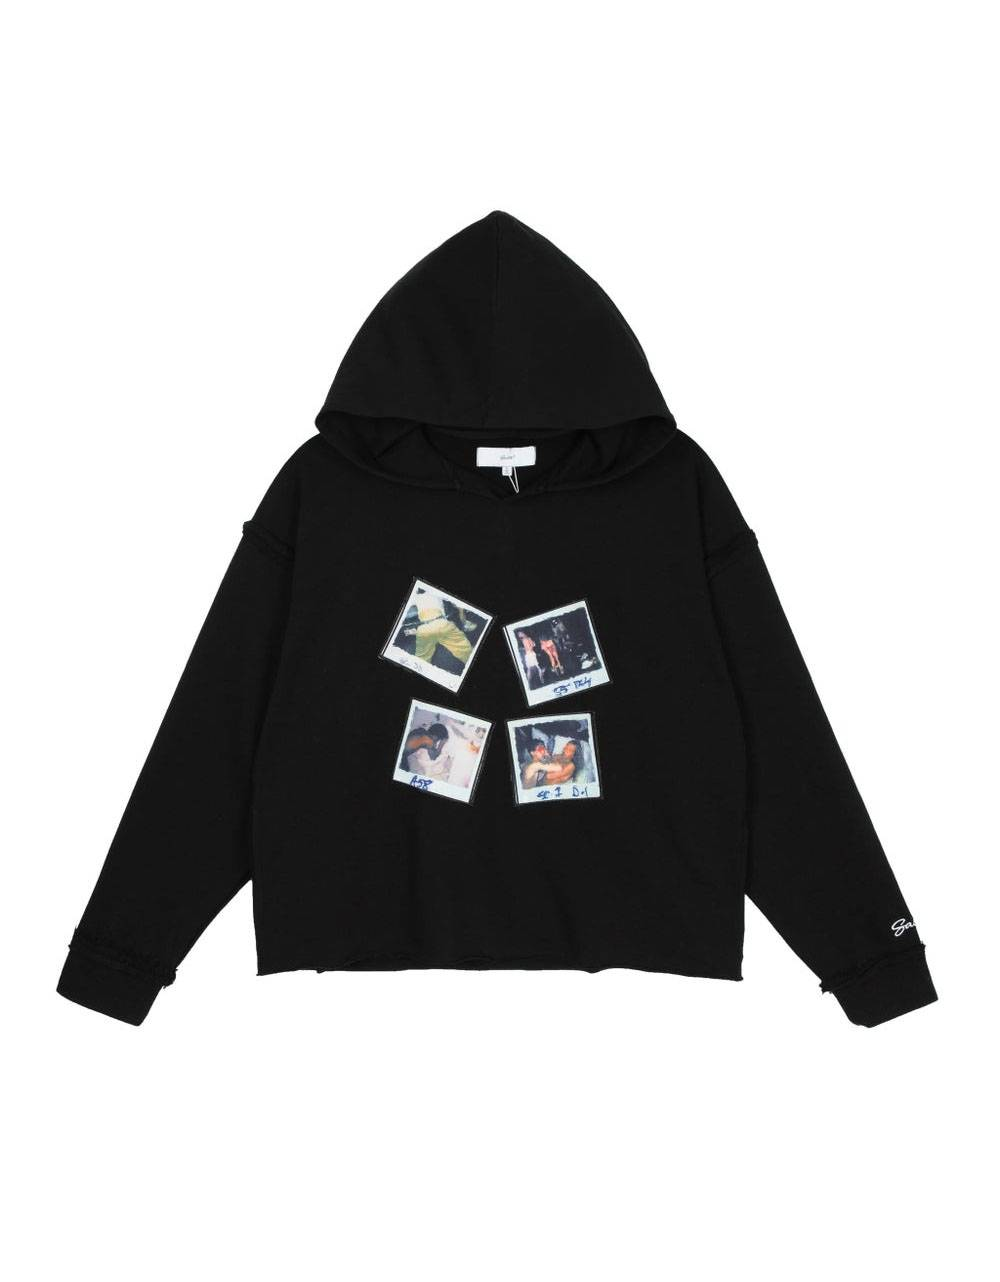 Salute HK Polaroid box fit cropped hoodie - black Salute HK Sweater 140,00€